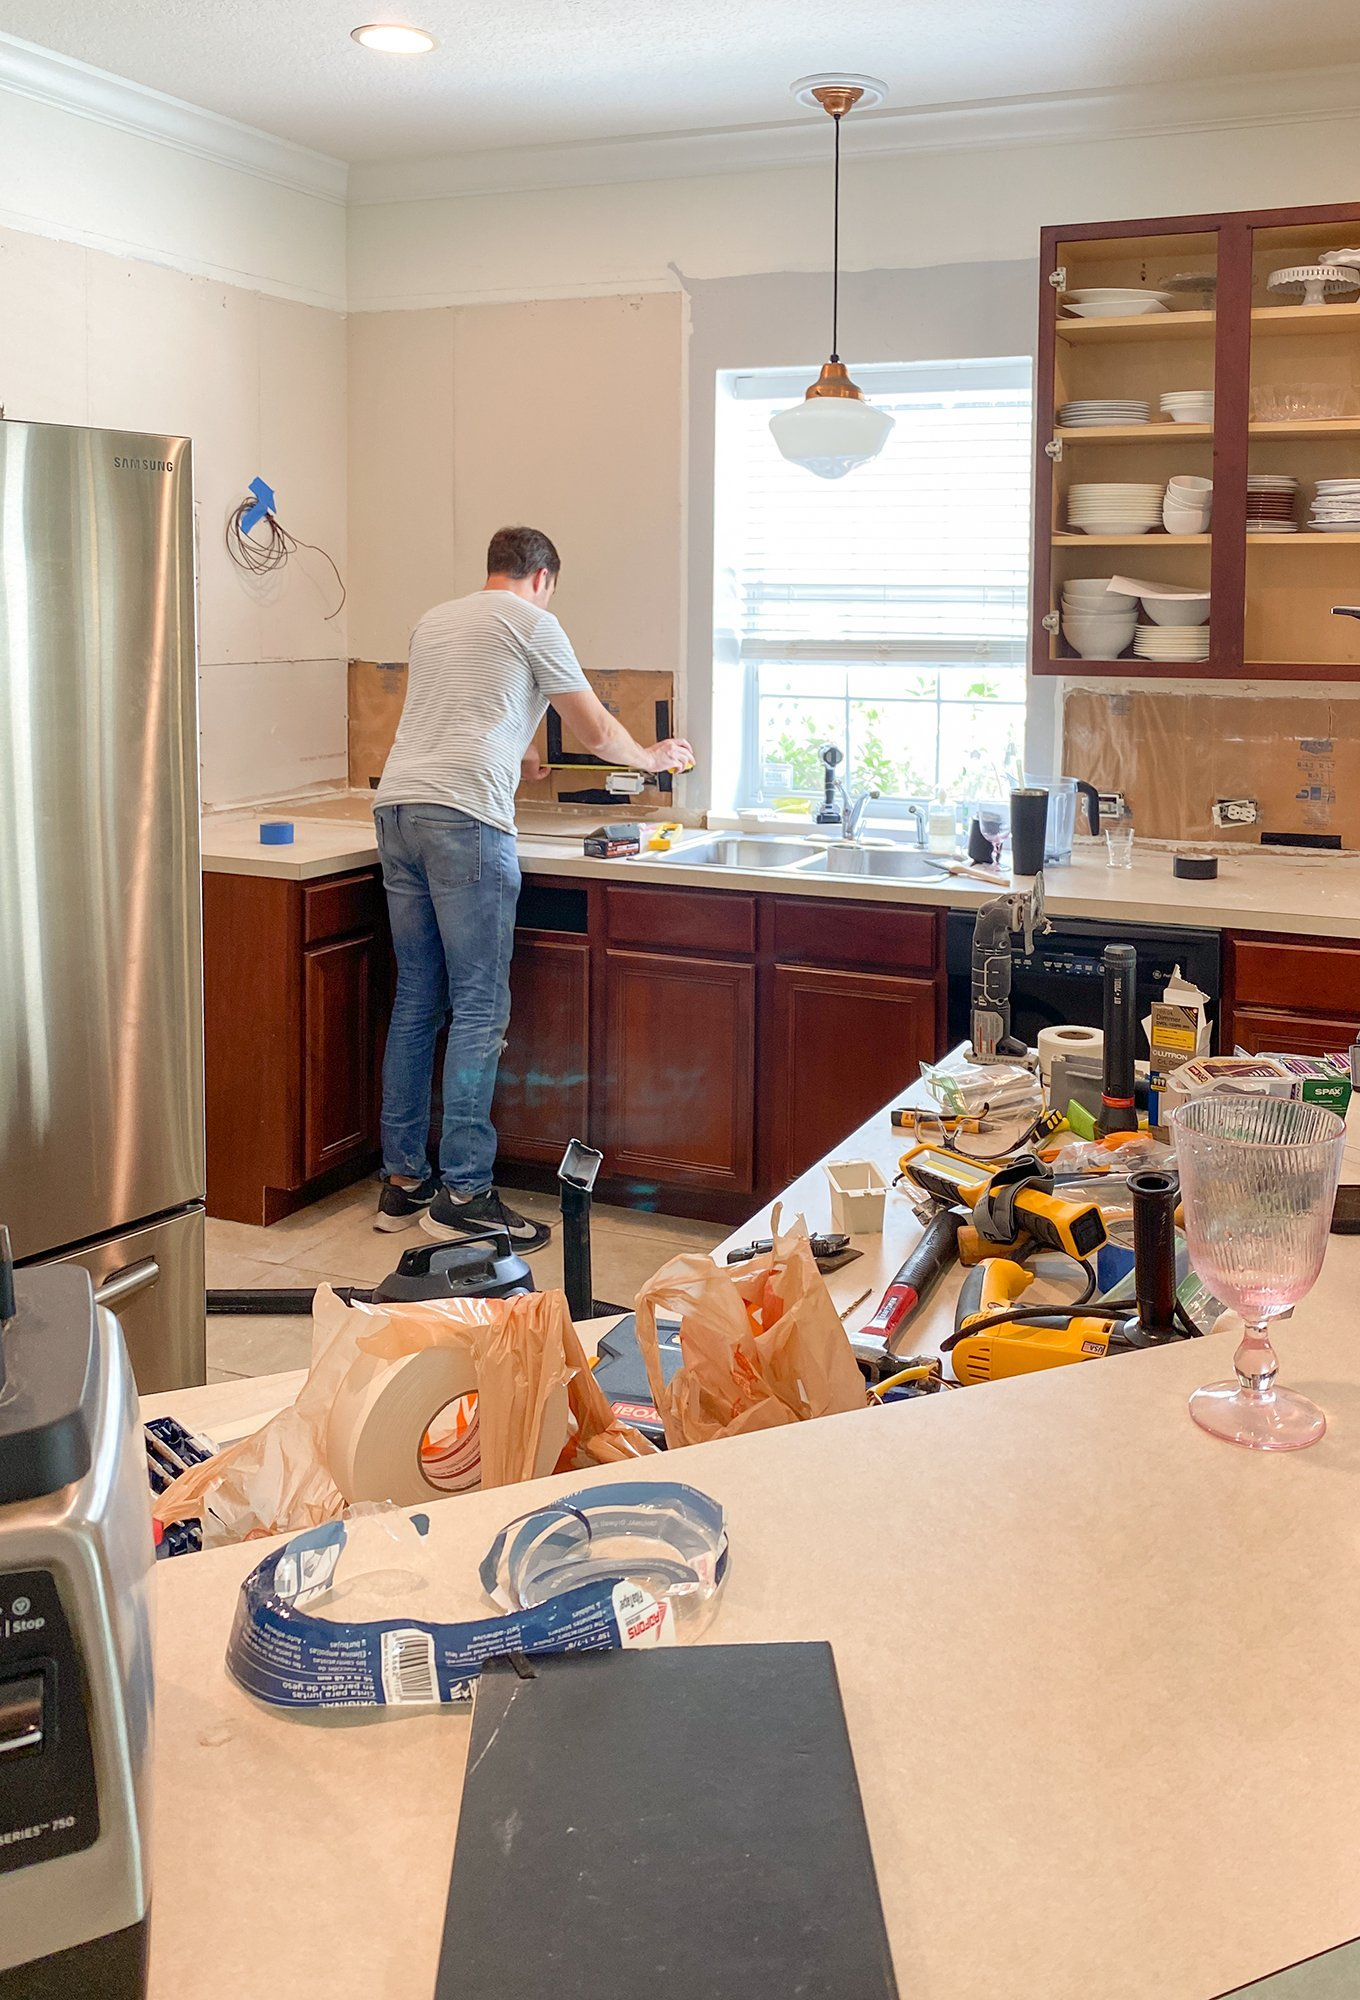 Ashley Brooke's Green Kitchen renovation - tearing out the backsplash